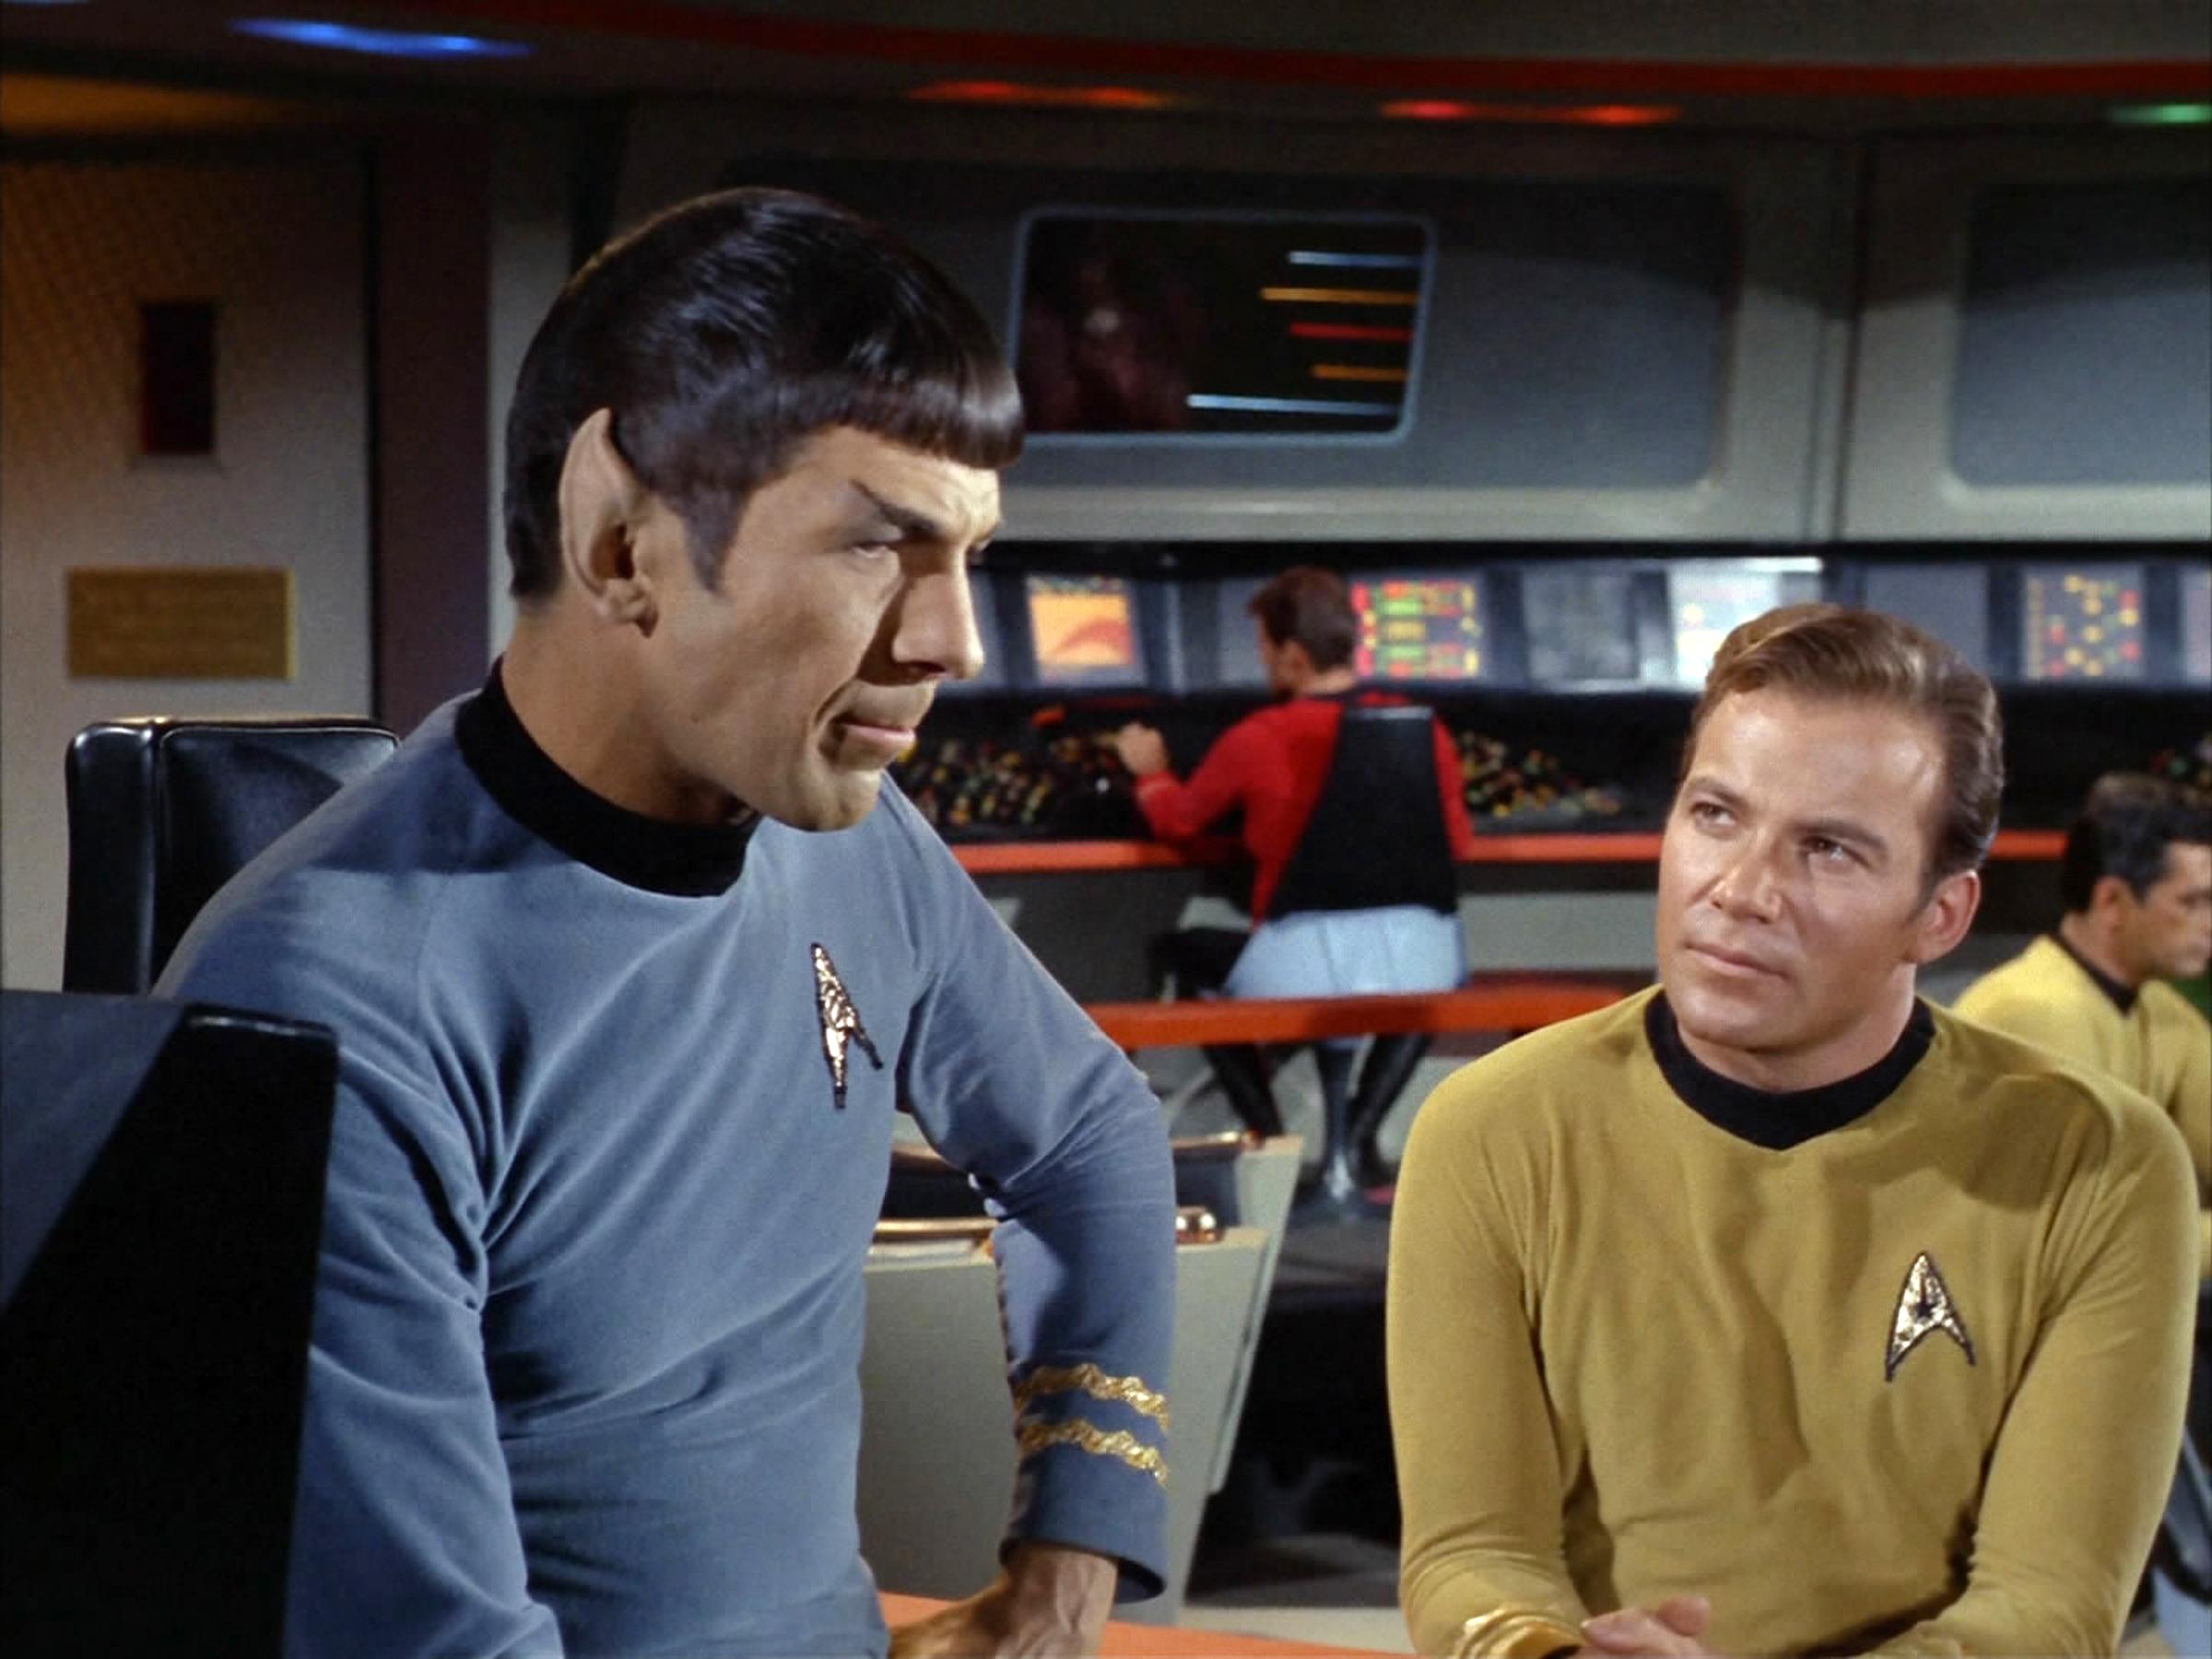 Leonard Nimoy as Commander Spock and William Shatner as Captain James T. Kirk on the bridge of the USS Enterprise on Star Trek: The Original Series on Feb. 16, 1967.